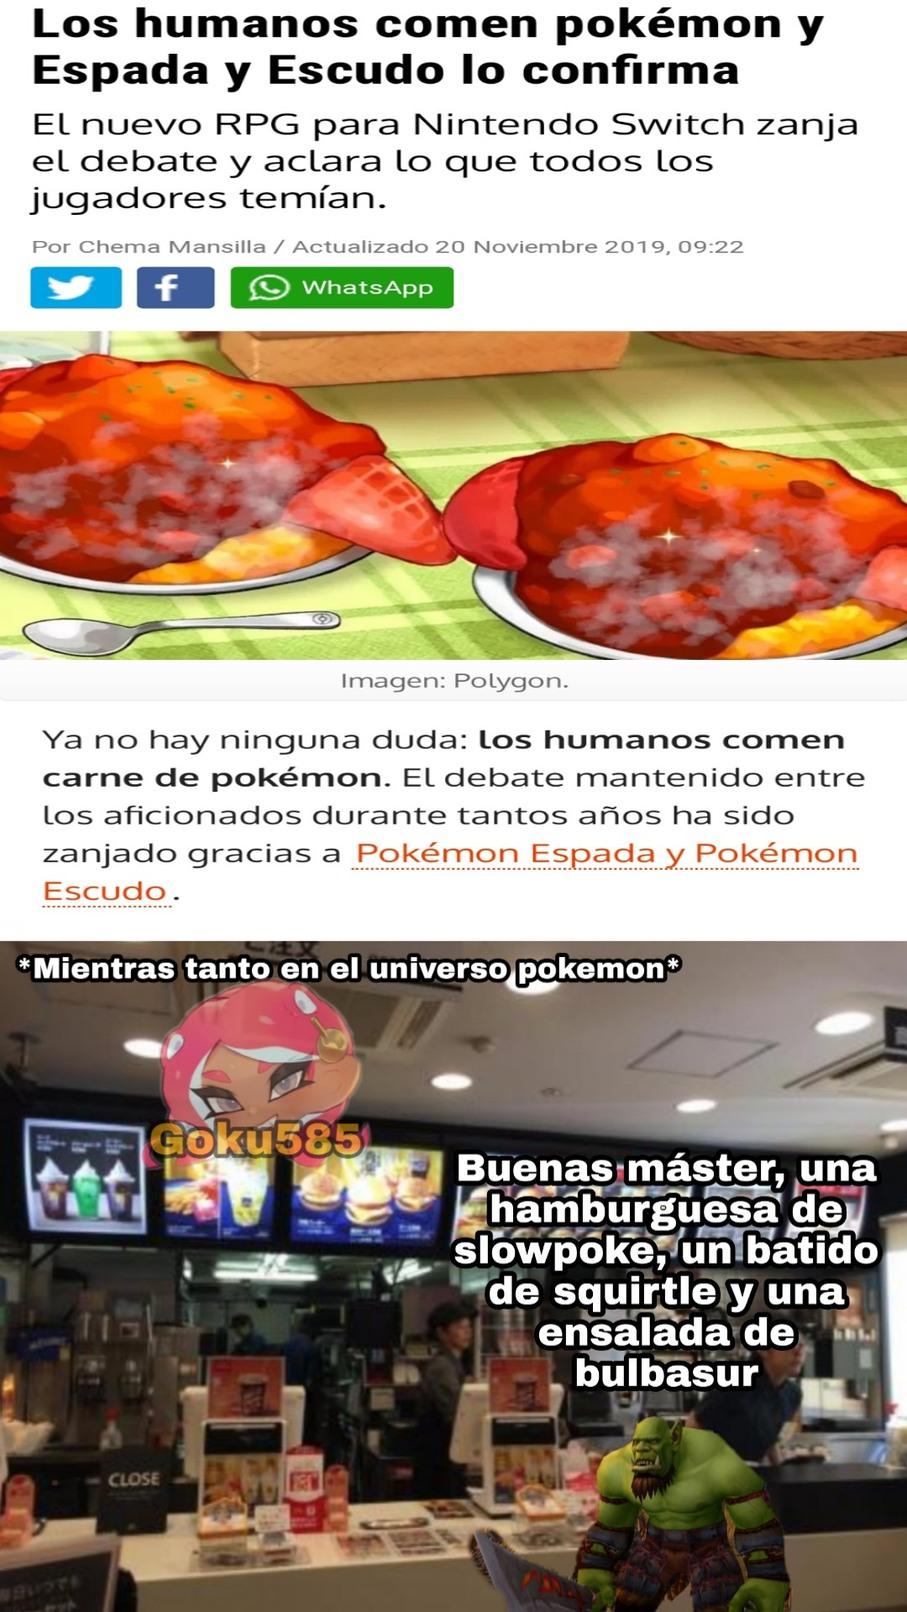 Malditos bastardos, dejen a los pokemon tranquilos >:( - meme